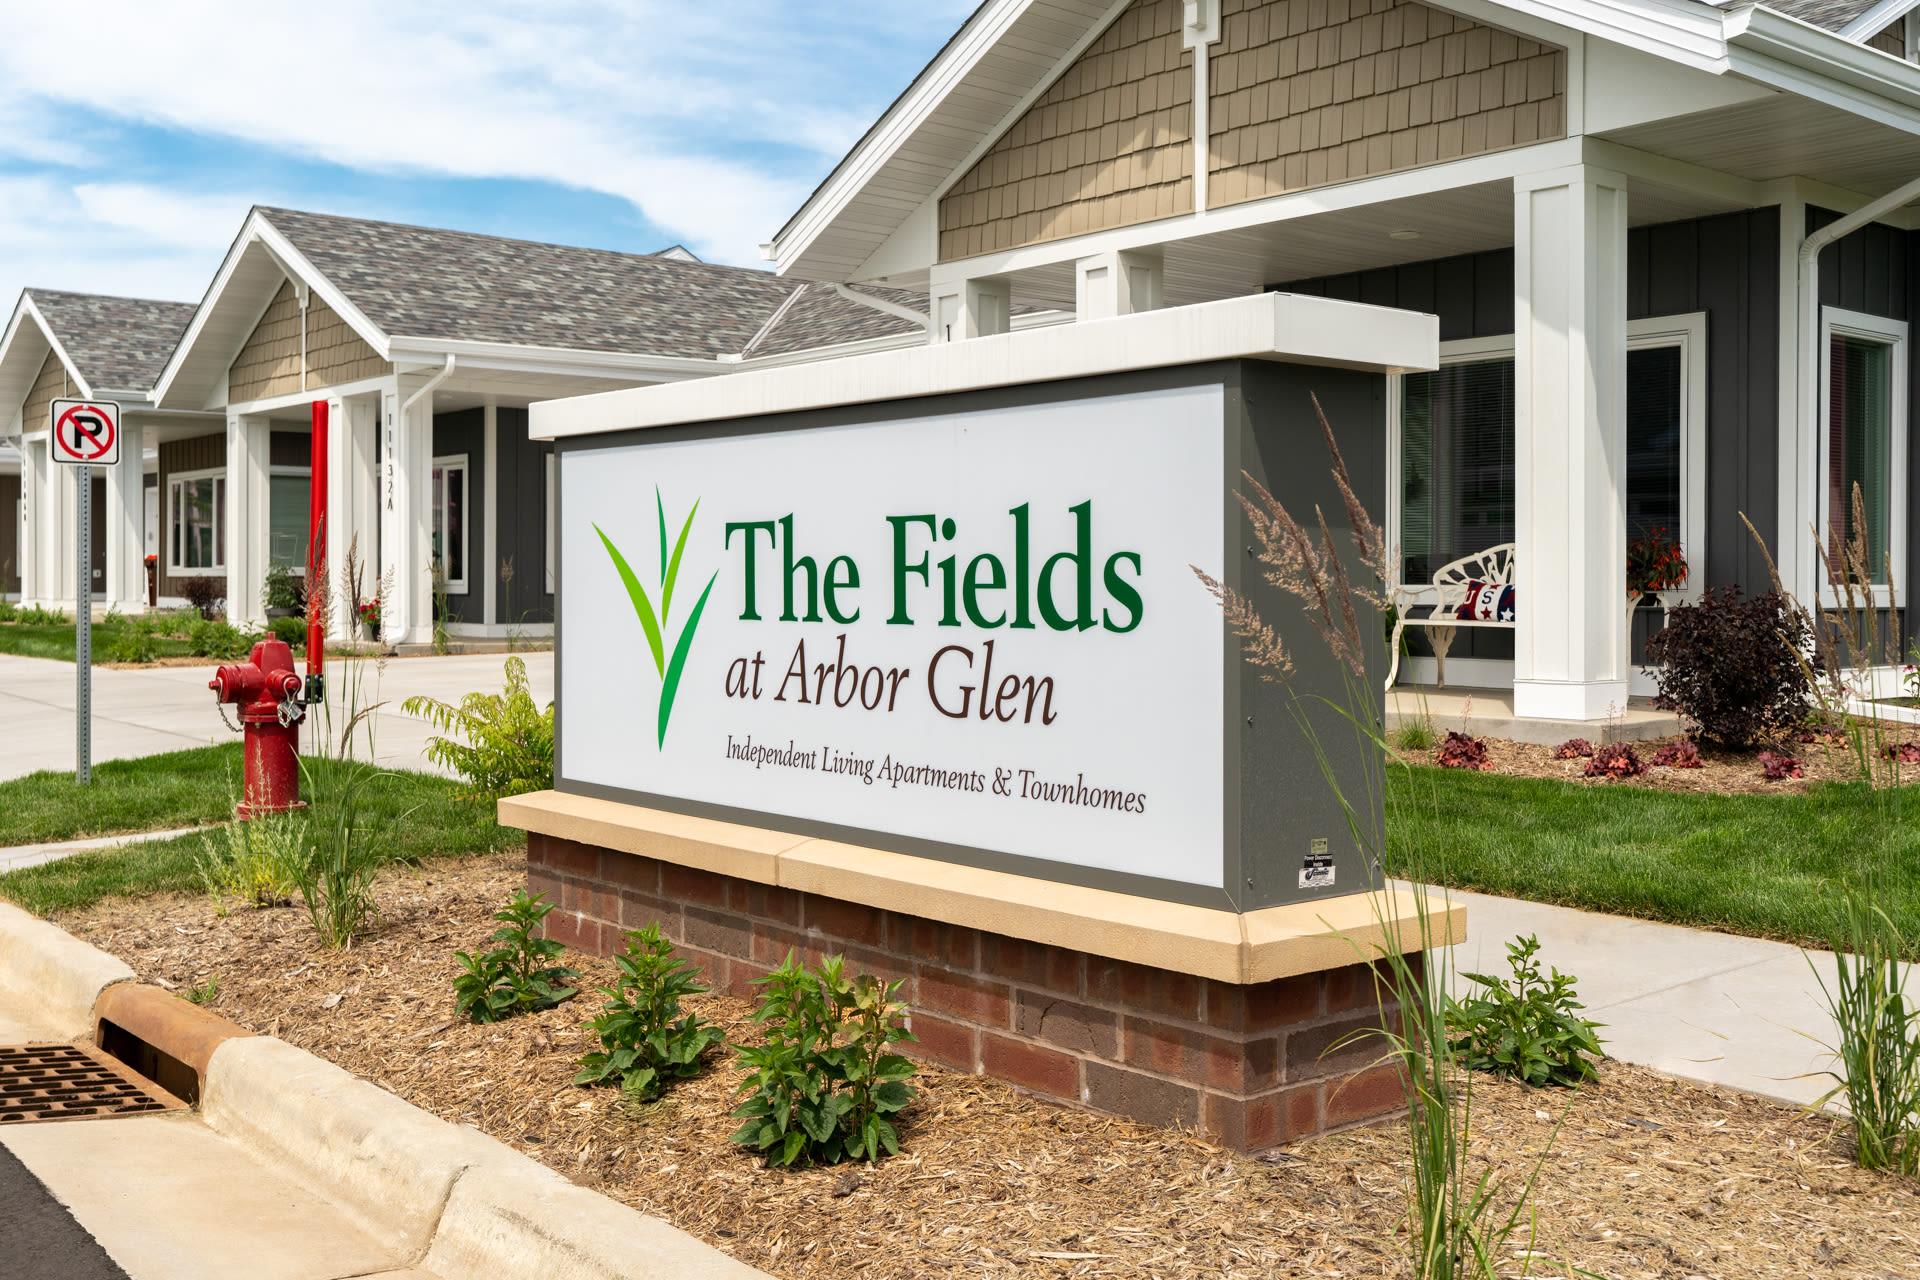 The Fields at Arbor Glen outdoor sign in Lake Elmo, Minnesota